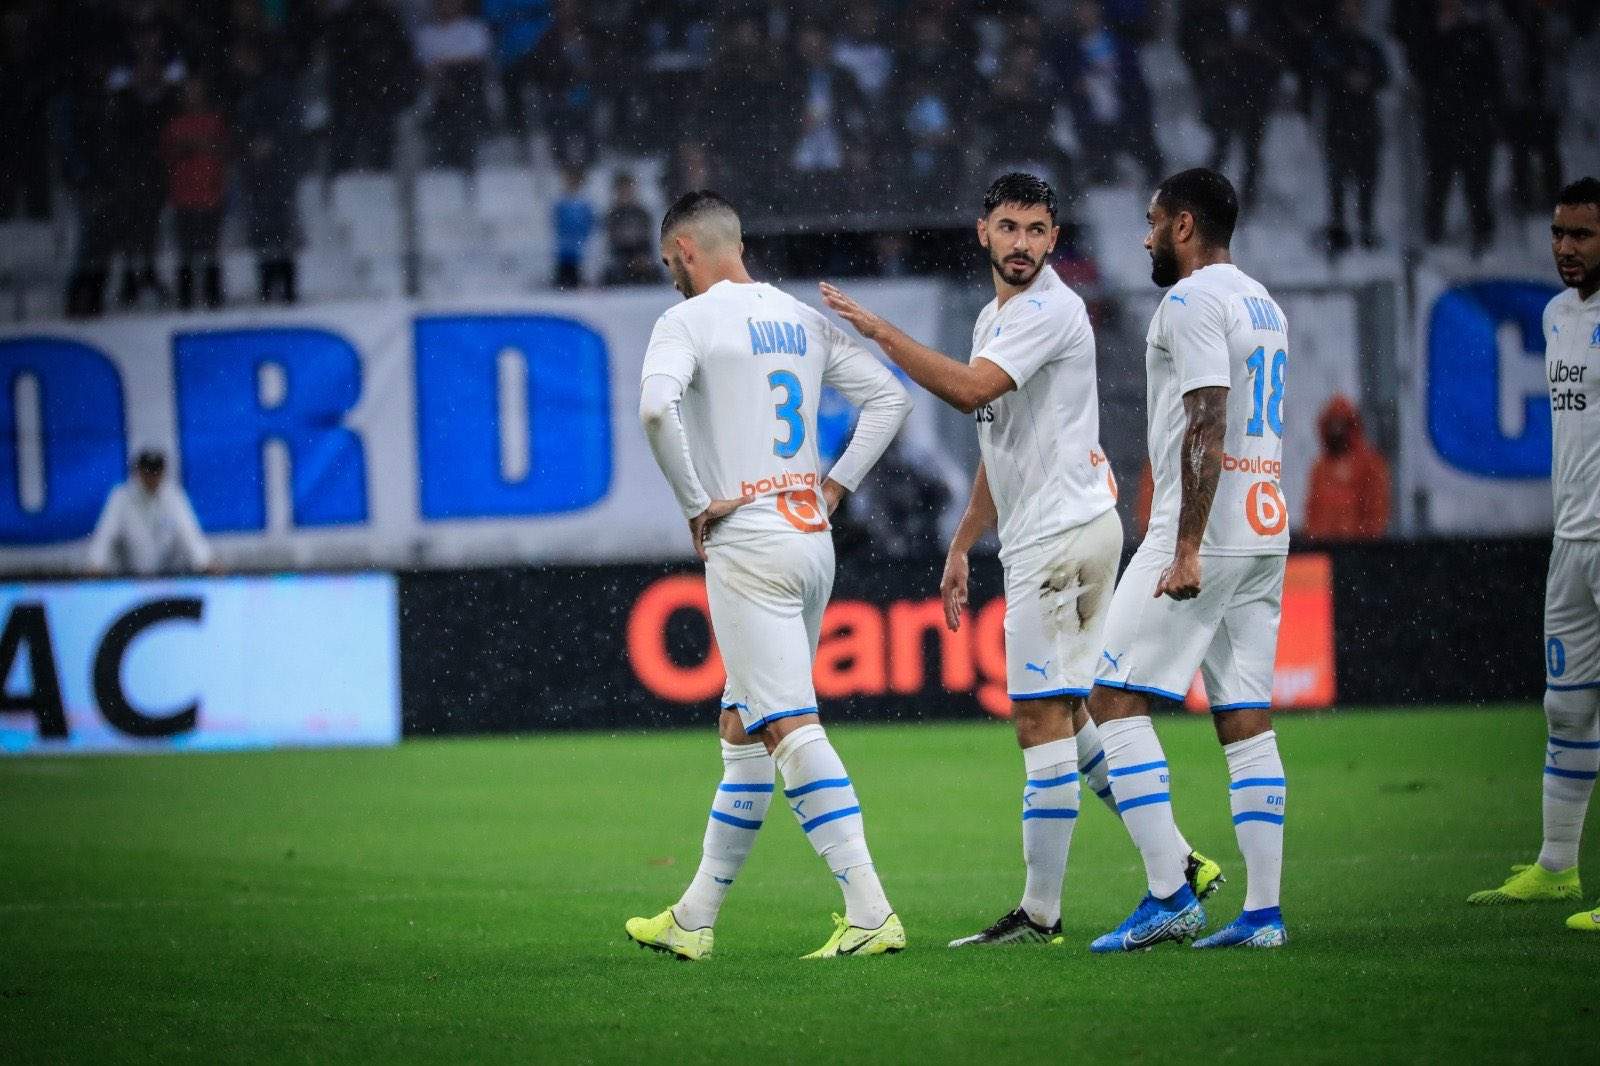 Álvaro González se retira lesionado en el OM-Montpellier (Foto: @OM_Officiel).